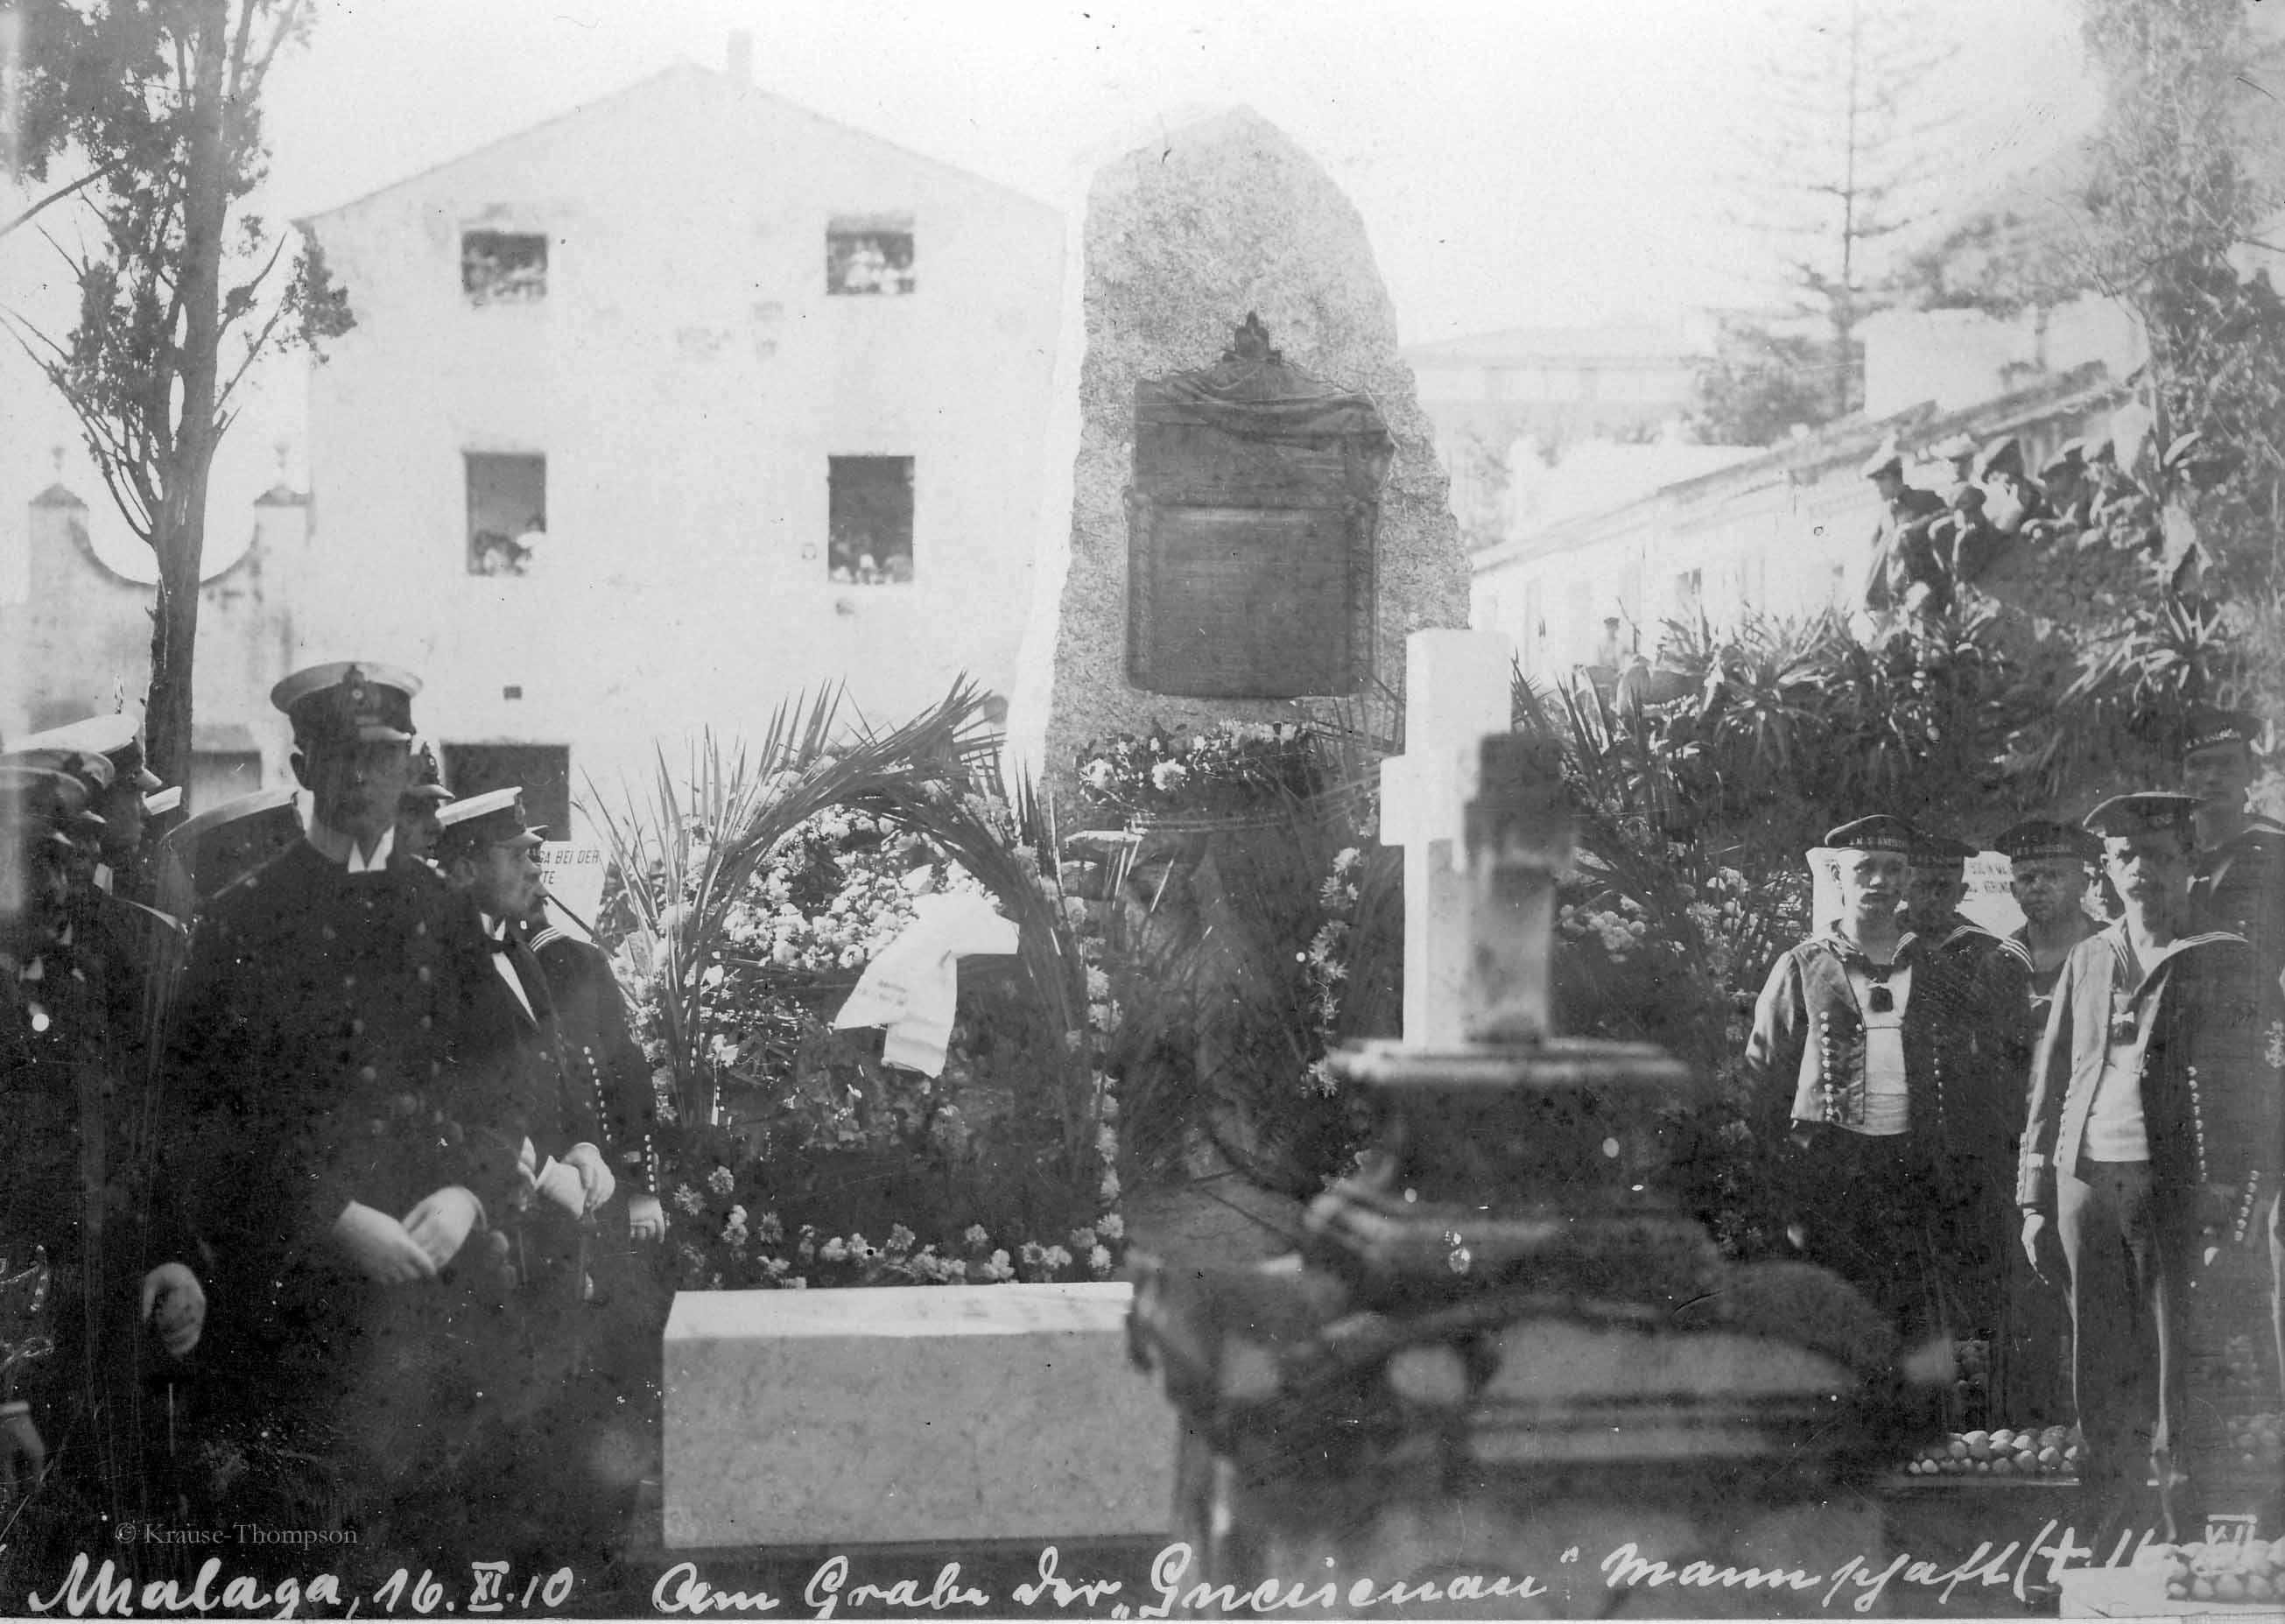 Nov-16-1910 at grave of Gneisenau crew